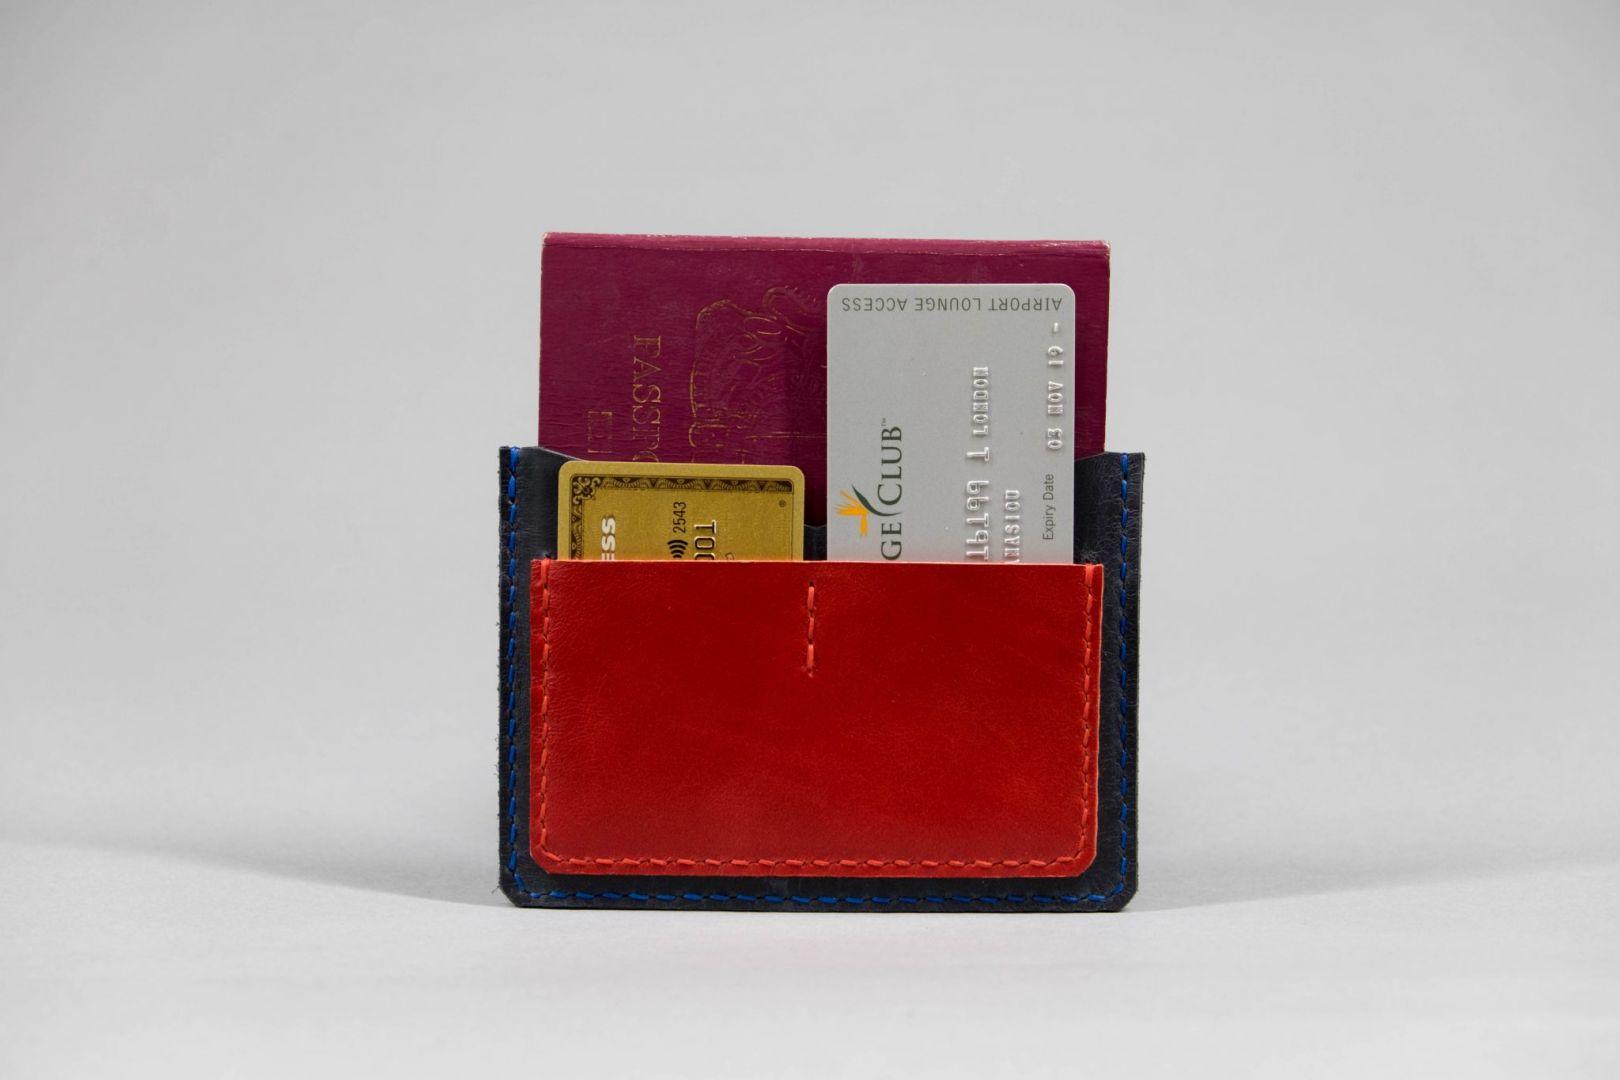 Slim passport holder